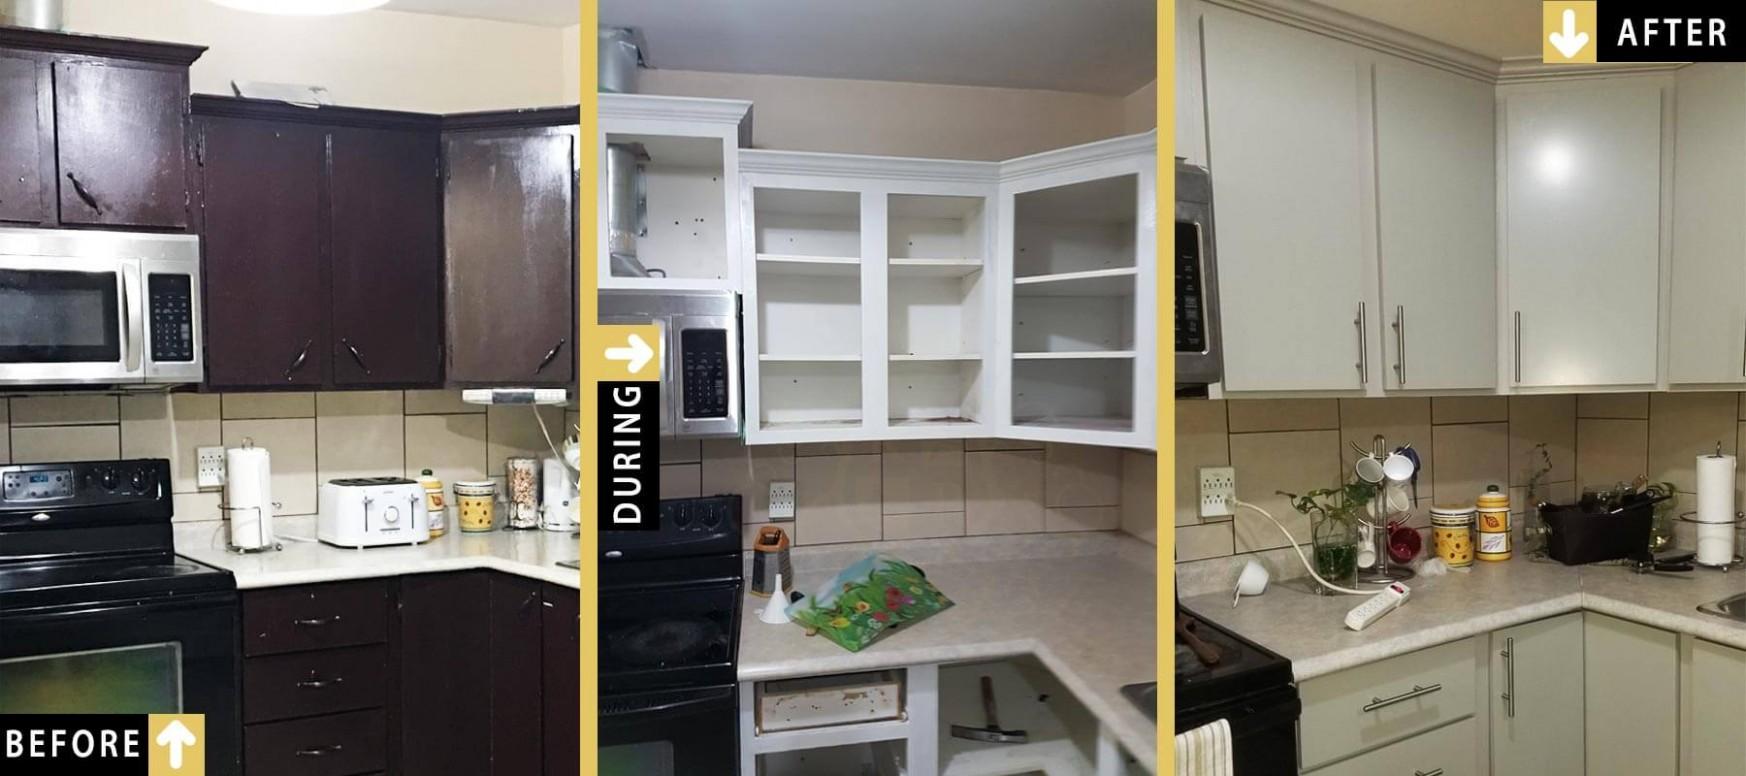 Toronto Kitchen Cabinets Spray Painting Gallery – Royal Home  - Kitchen Cabinet Painting Toronto